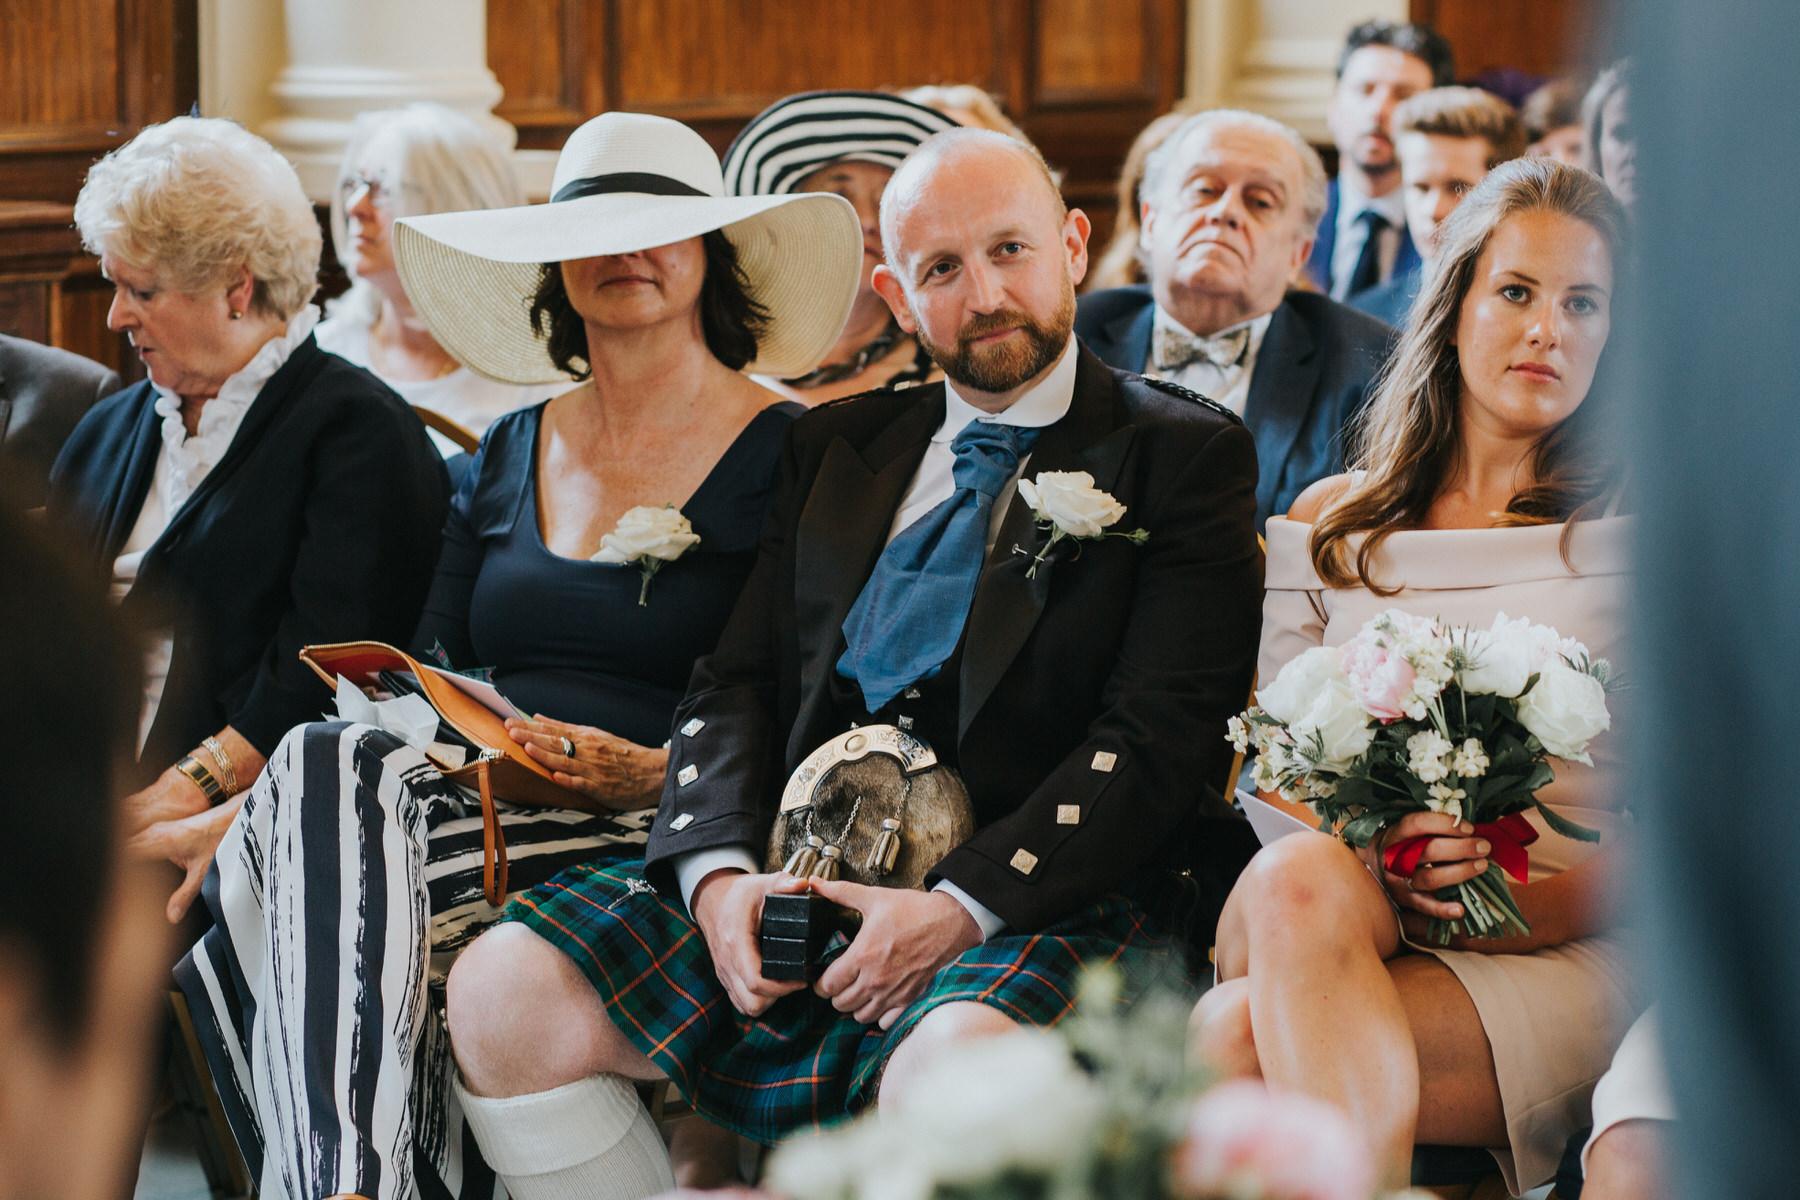 96 scottish ring bearer wedding ceremony.jpg